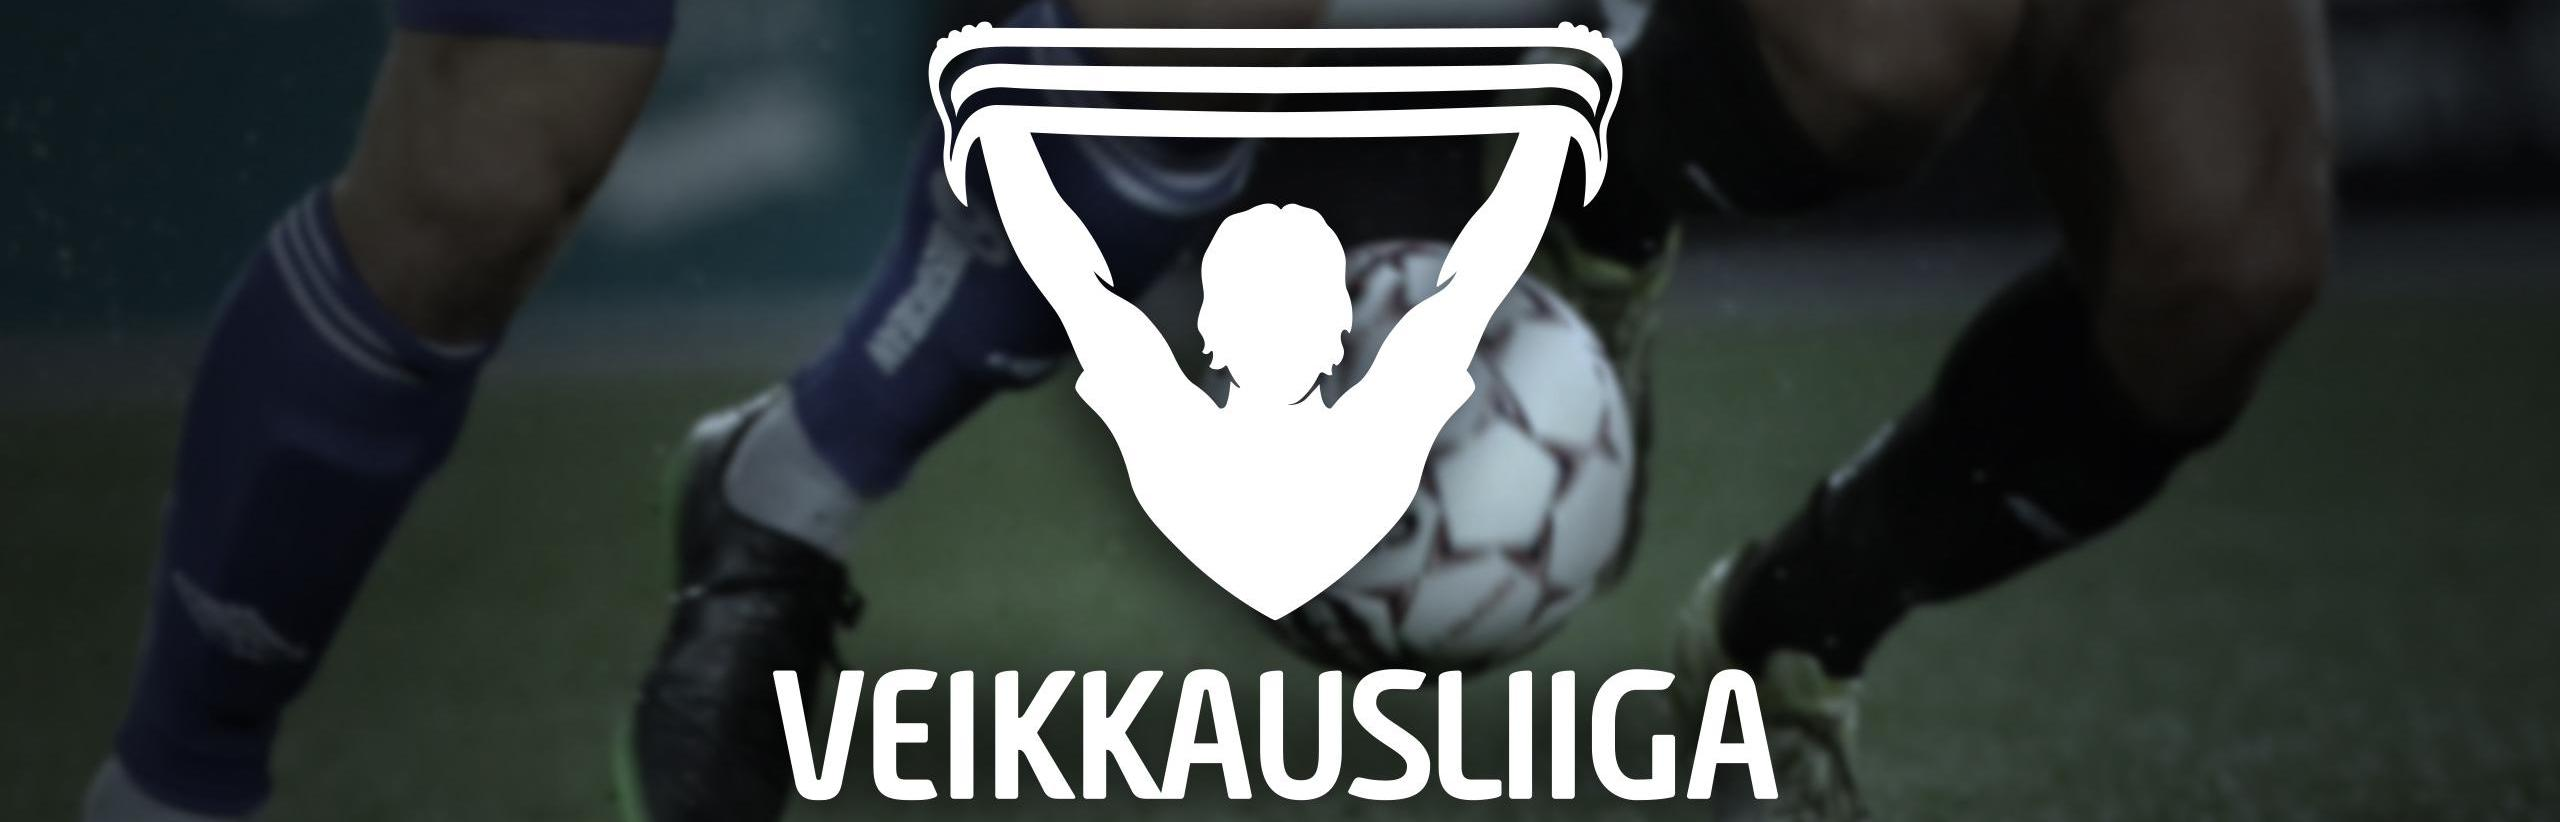 blog image FINLAND, Veikkausliiga